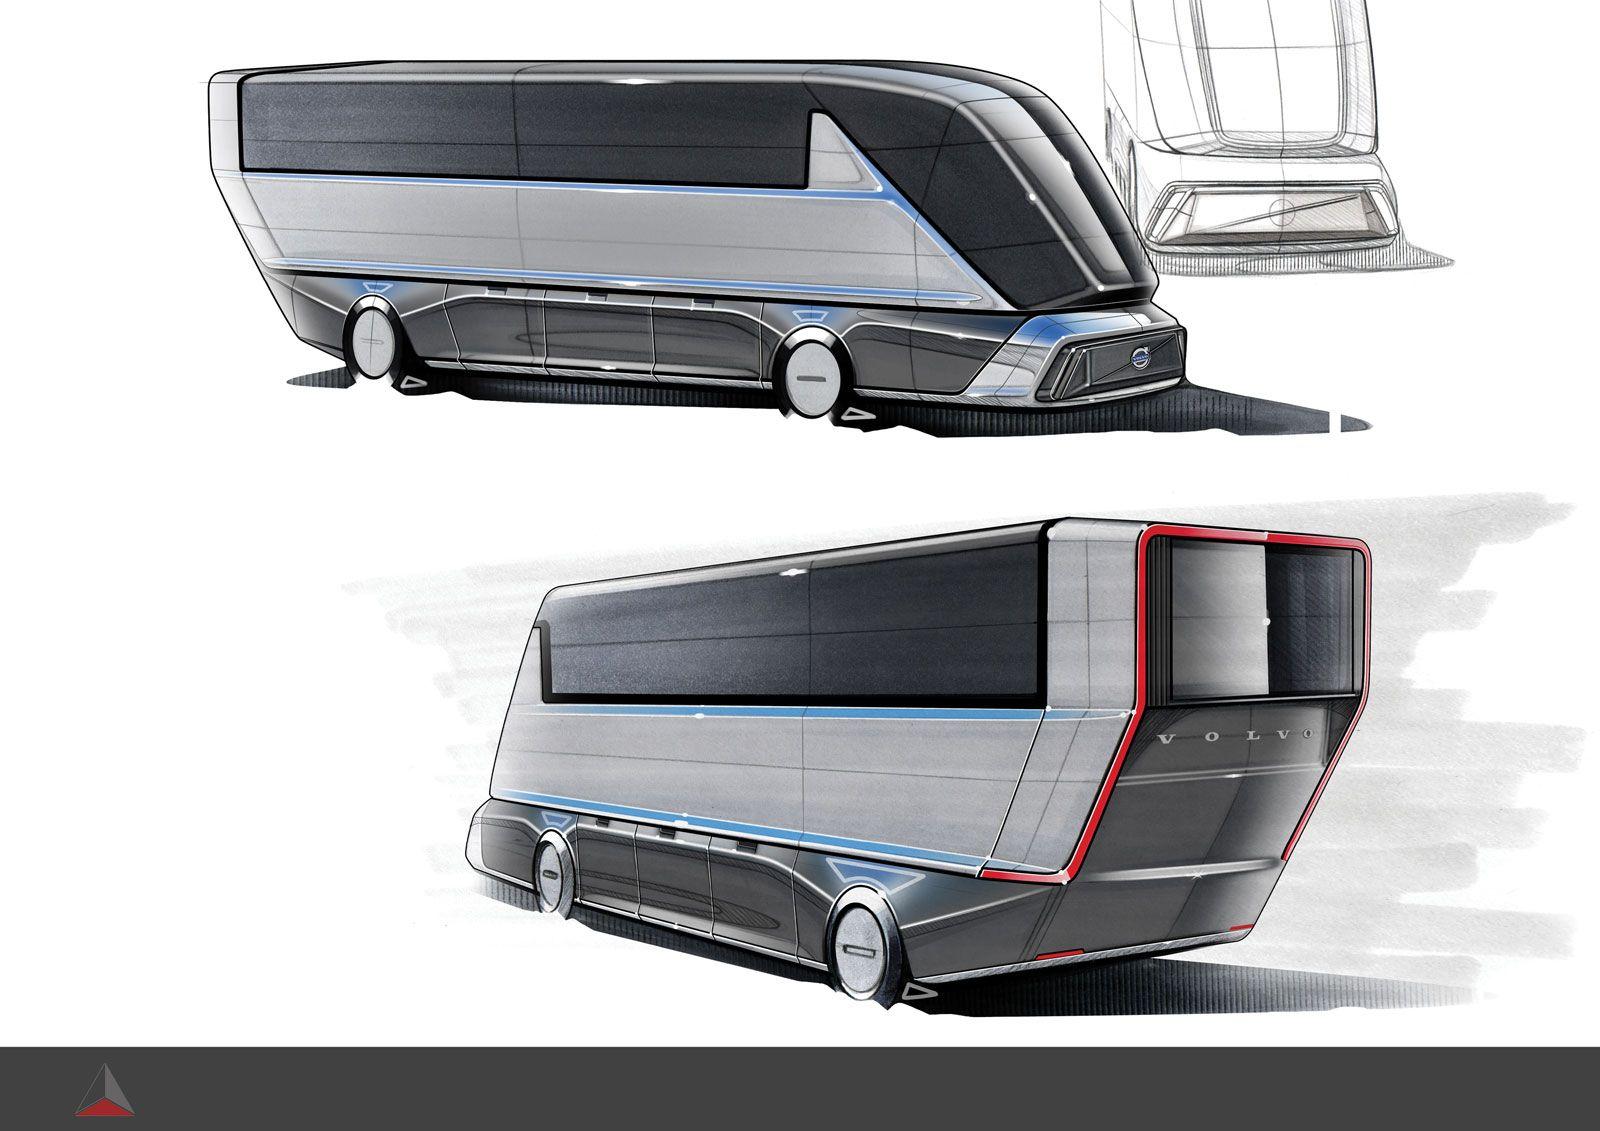 Volvo Bus Concept Design Sketches by Alireza Saeedi, former student at Car Design Academy #CarDesign #designer #design #designsketch #designsketching #AutoDesign #CarDrawing #CarDesignSketch #Bus #ConceptCar #Futuristic #CarBodyDesign